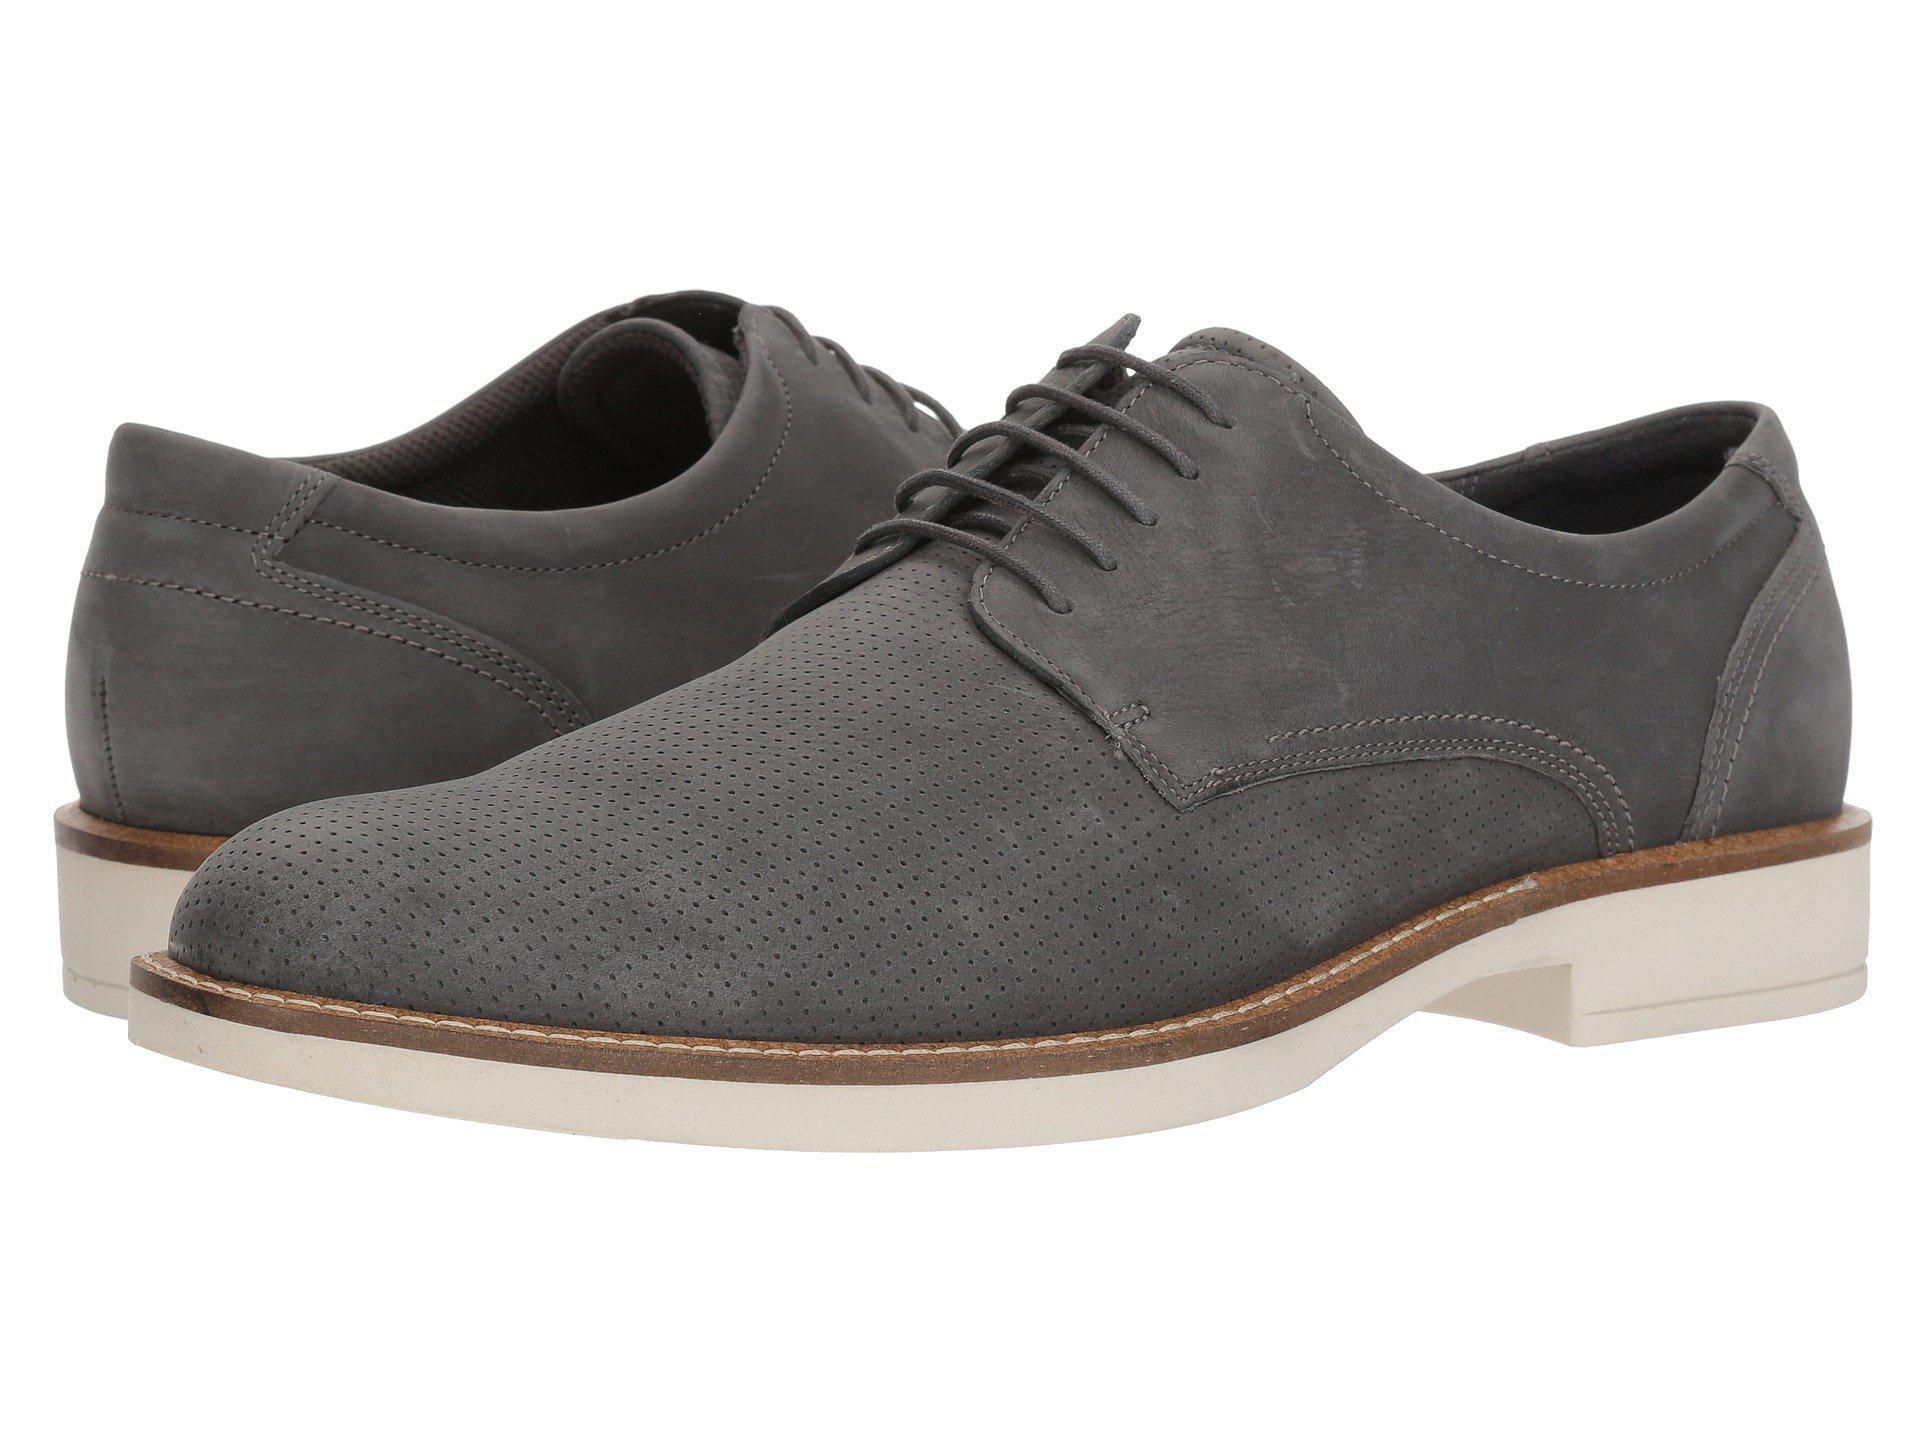 FOOTWEAR - Lace-up shoes Biarritz tIZs1